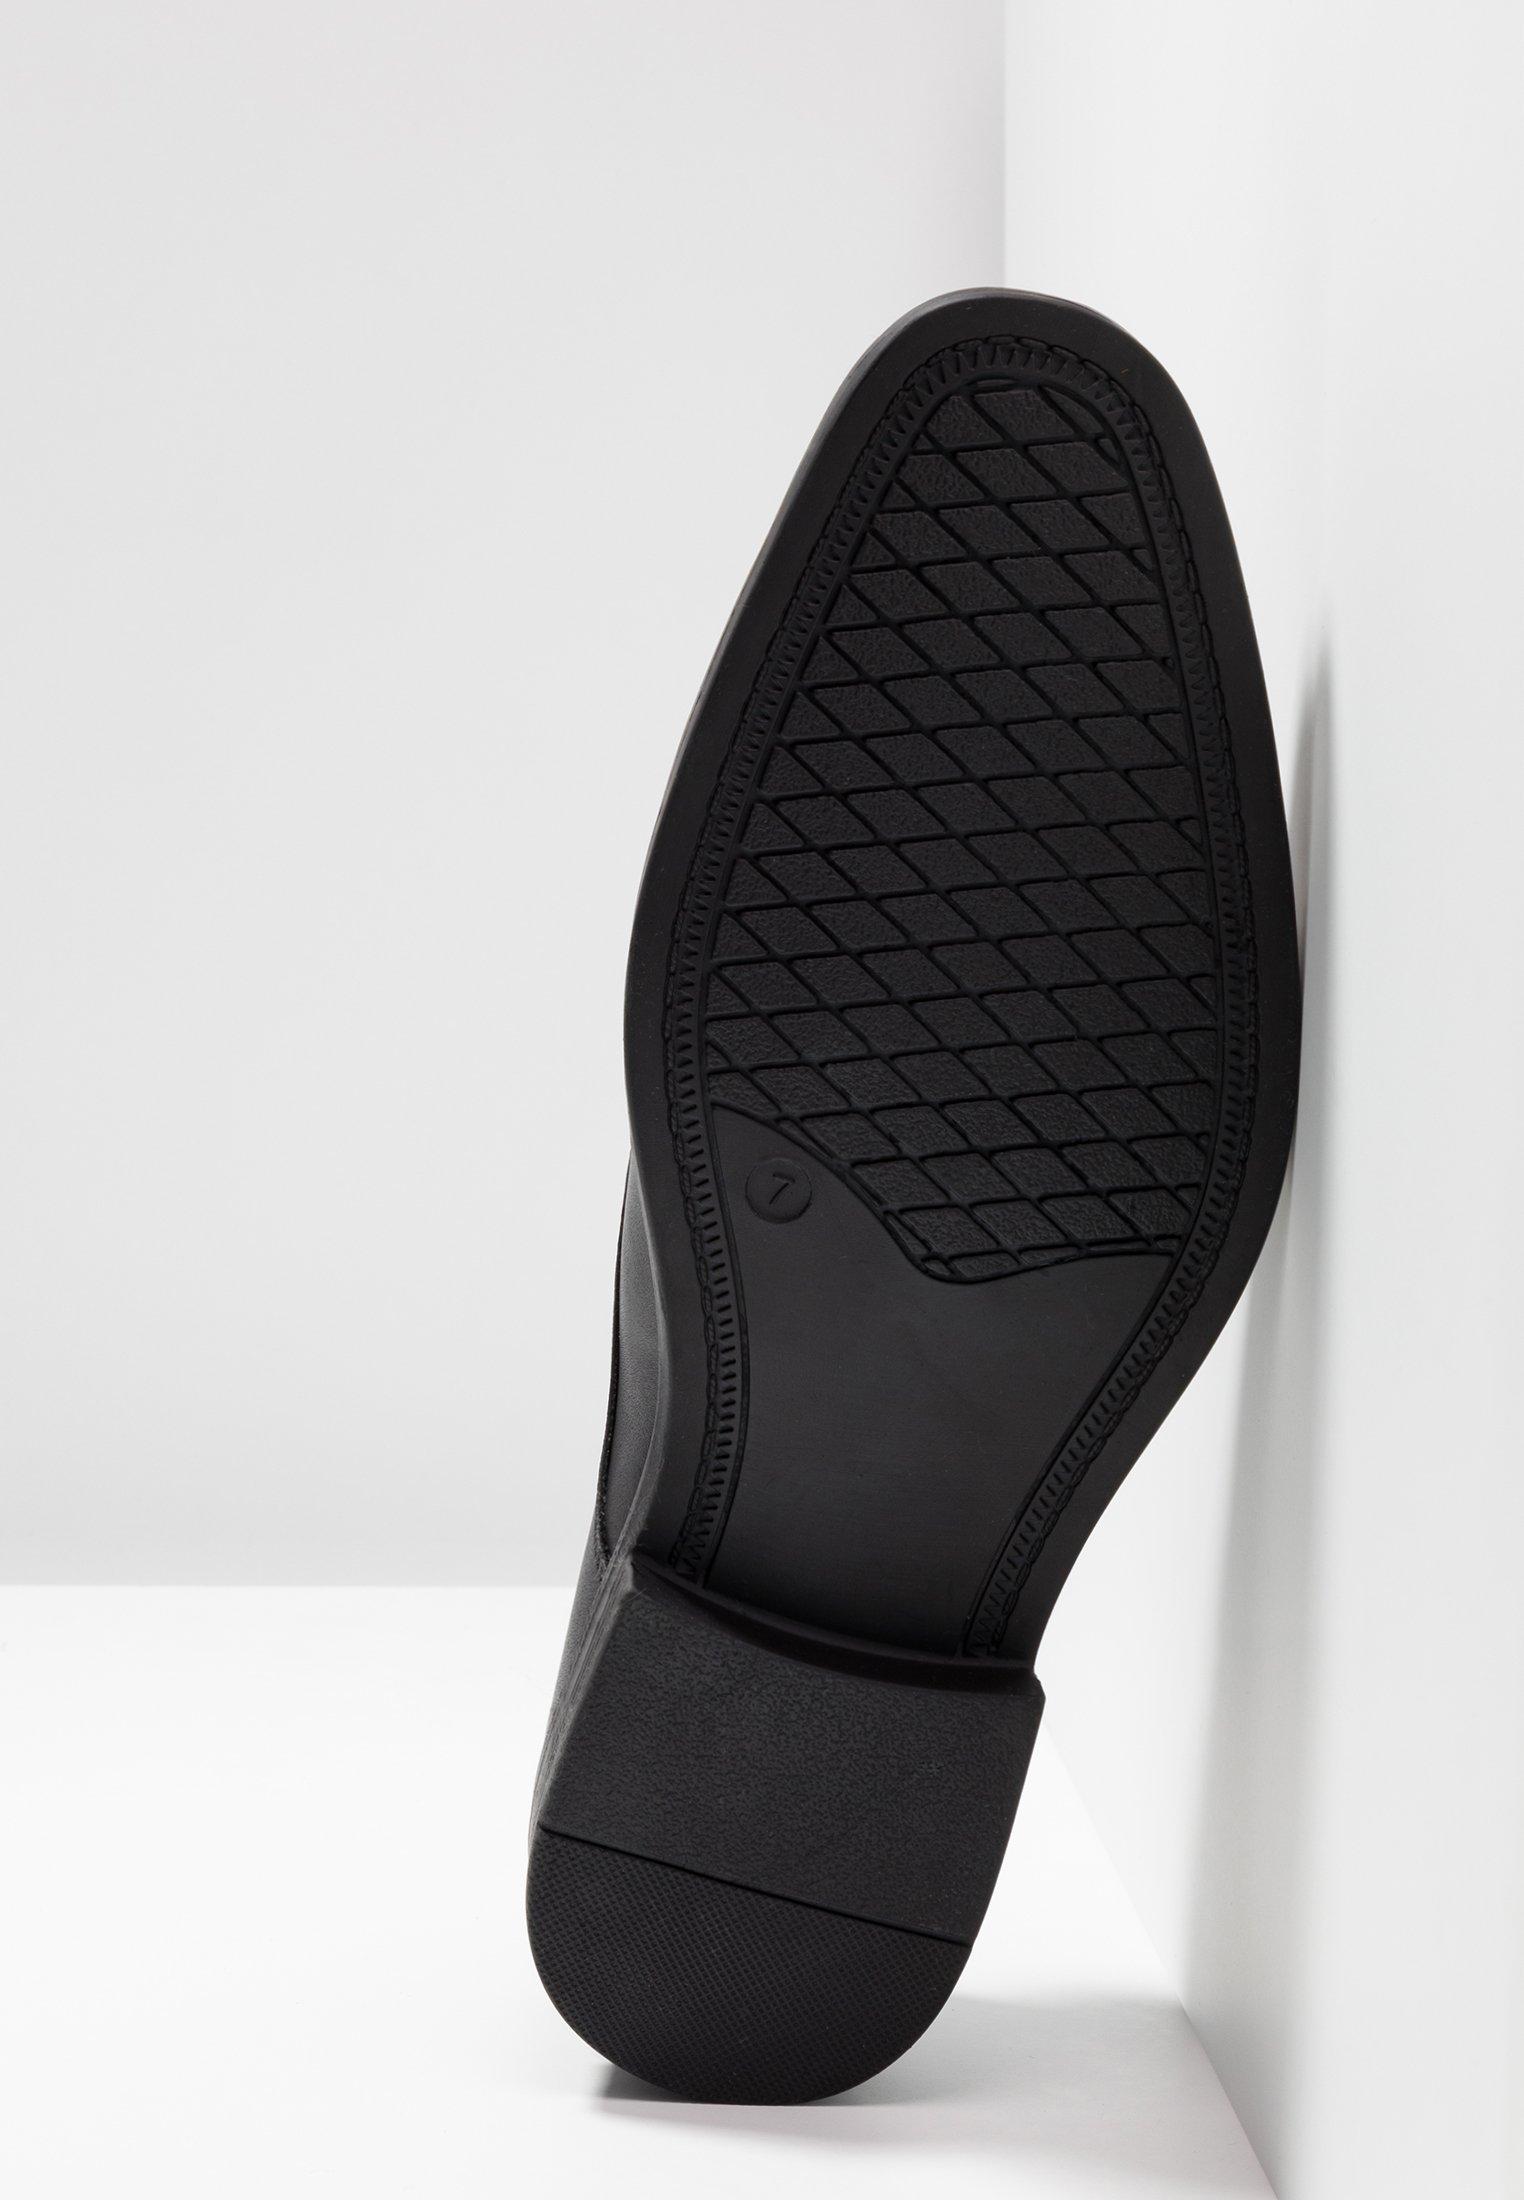 Jacamo Derby Richelieus ShoeDerbiesamp; Black Toe Cap ygvf76Yb